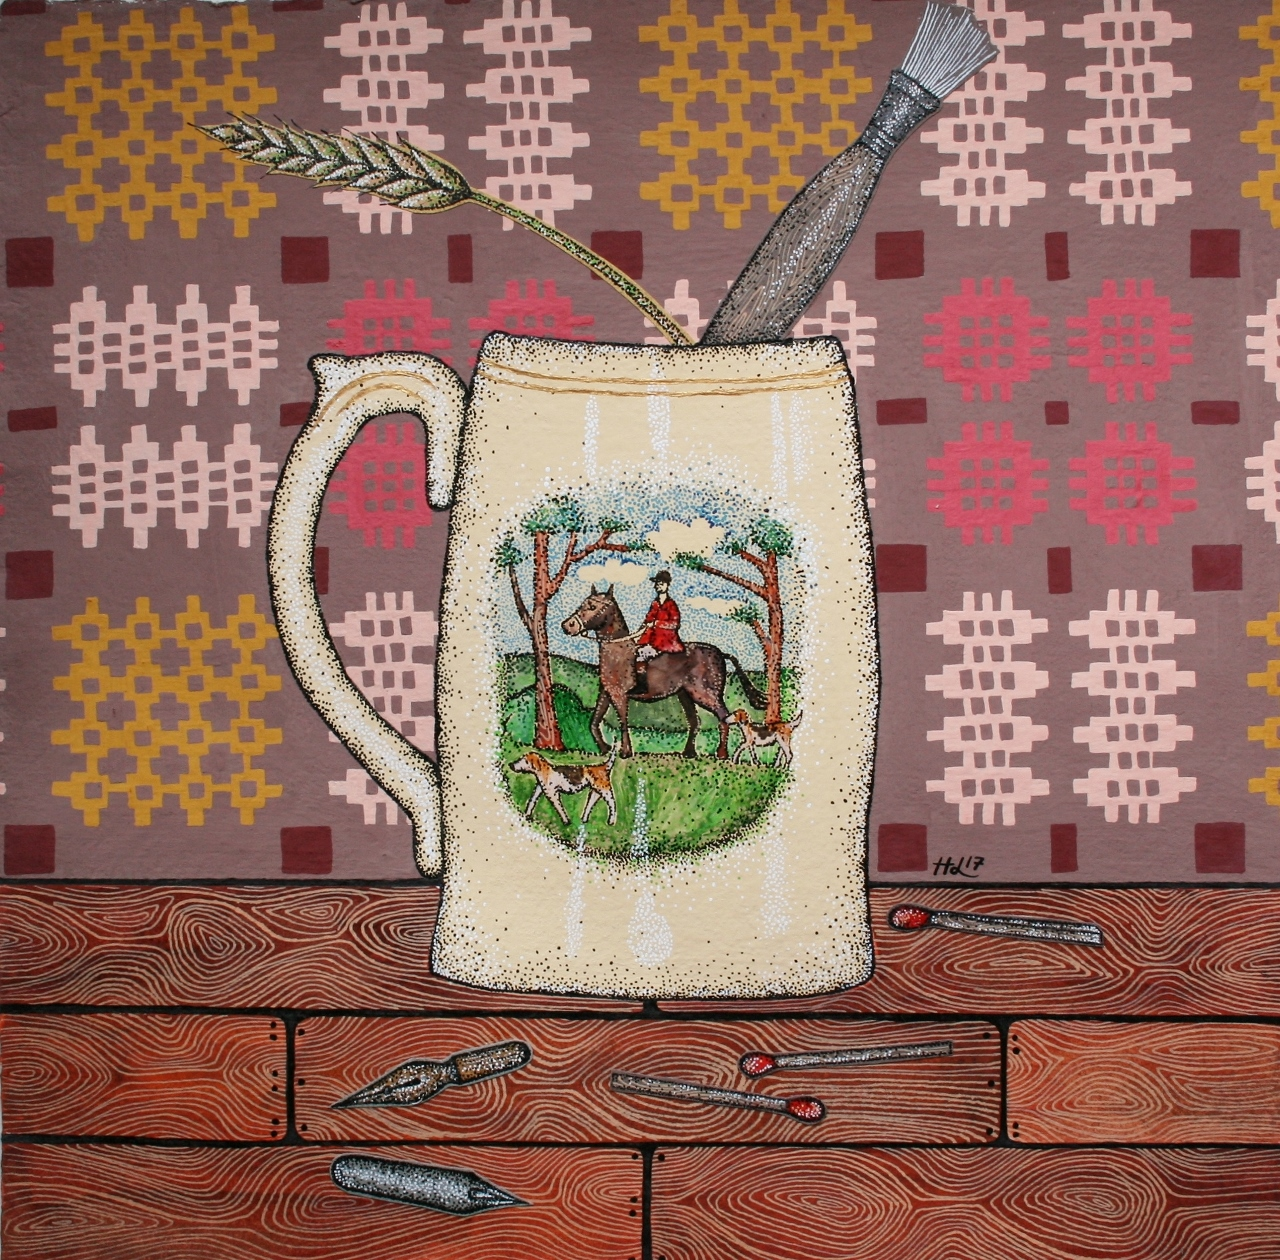 Still life with Paintbrush. watercolour, ink & gouache on paper. 2017. 29.5 cm x 29.5 cm